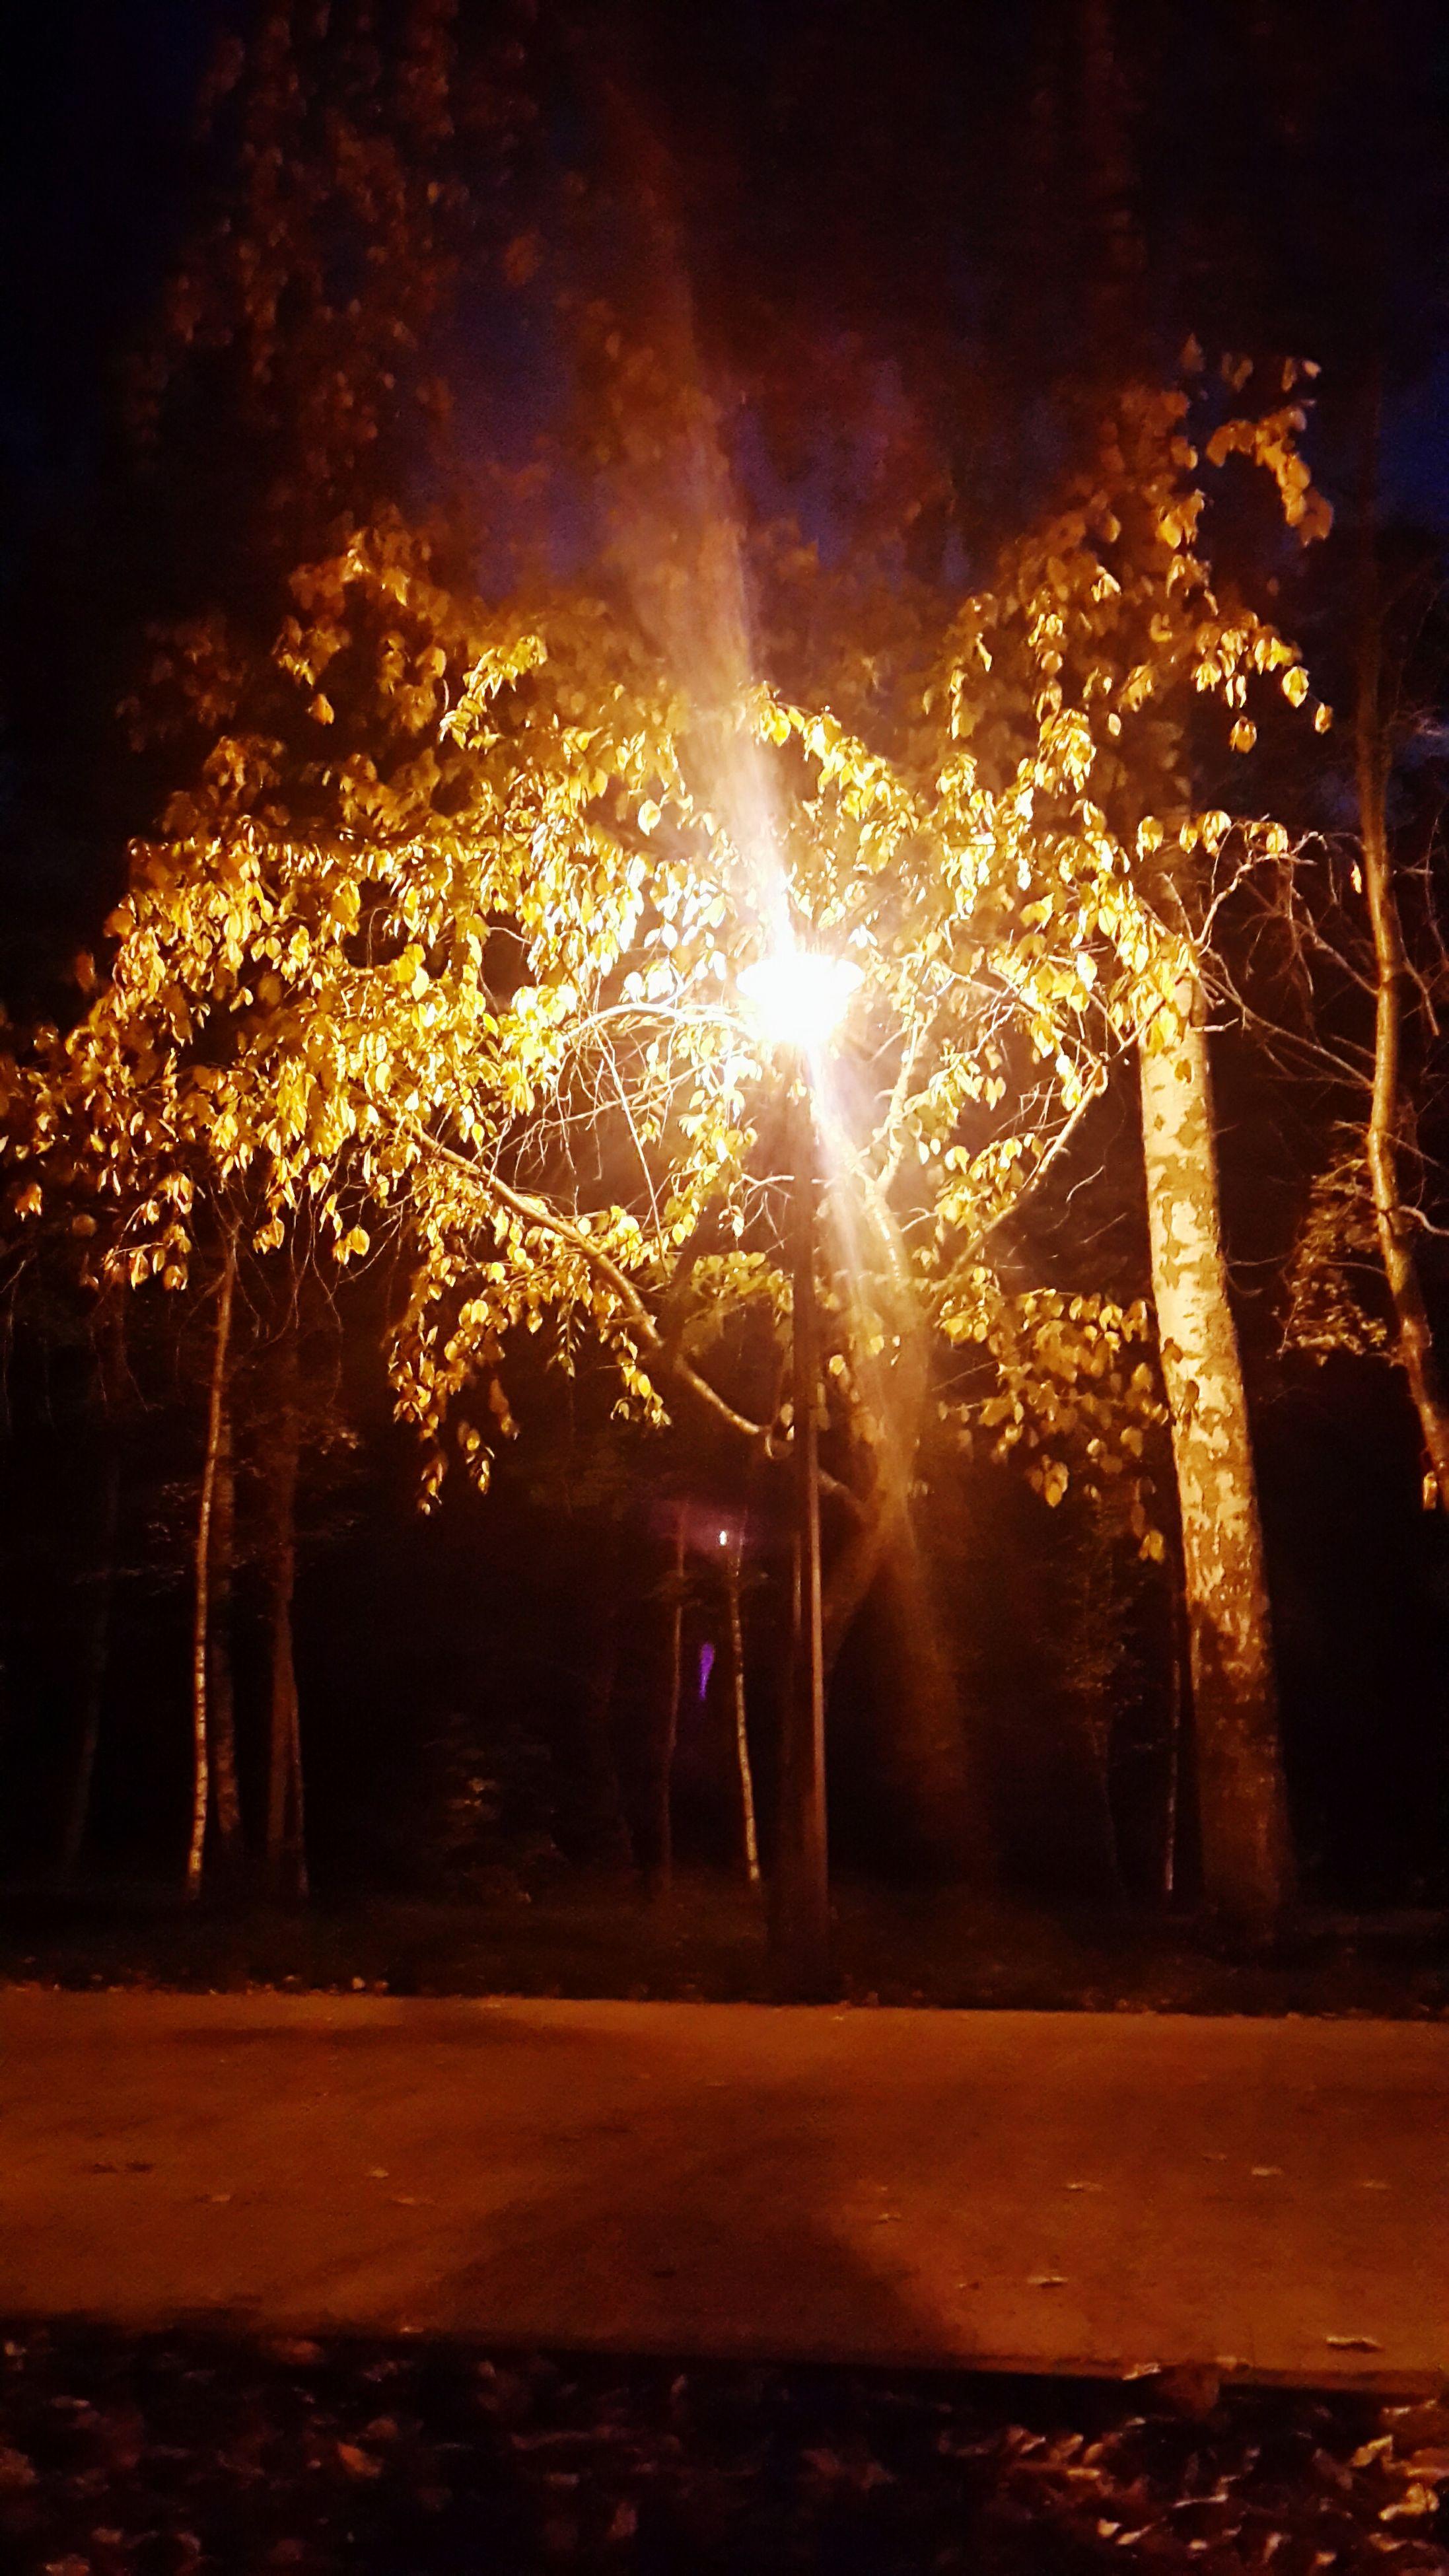 tree, night, illuminated, sunlight, lens flare, sun, sunbeam, glowing, nature, street light, street, the way forward, outdoors, tranquility, light - natural phenomenon, back lit, silhouette, growth, no people, sky